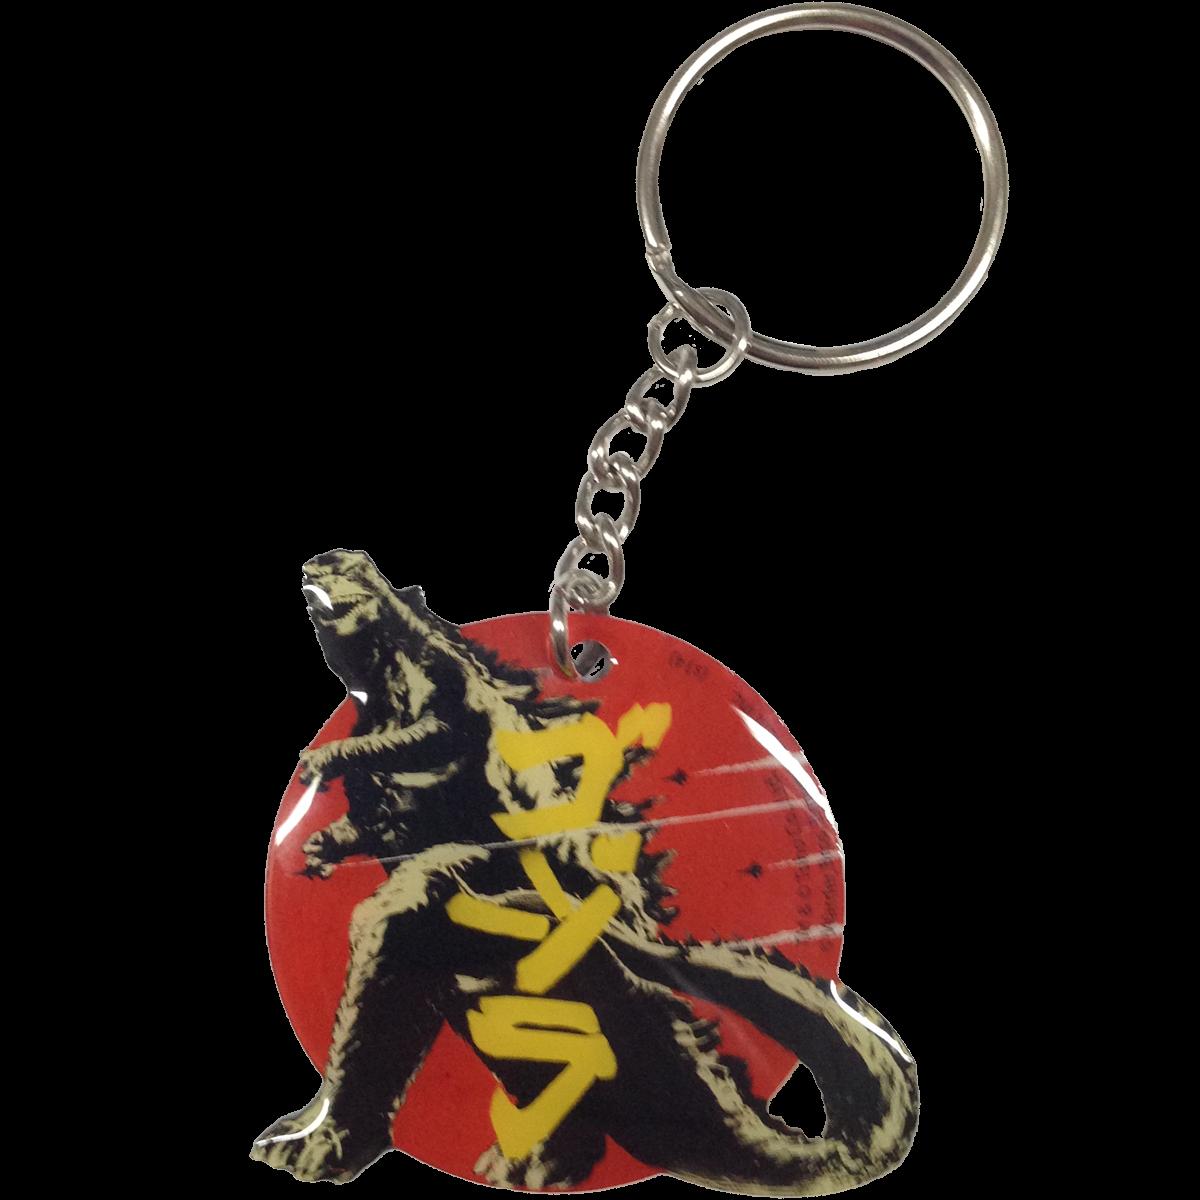 Godzilla Metall-Schlüsselring